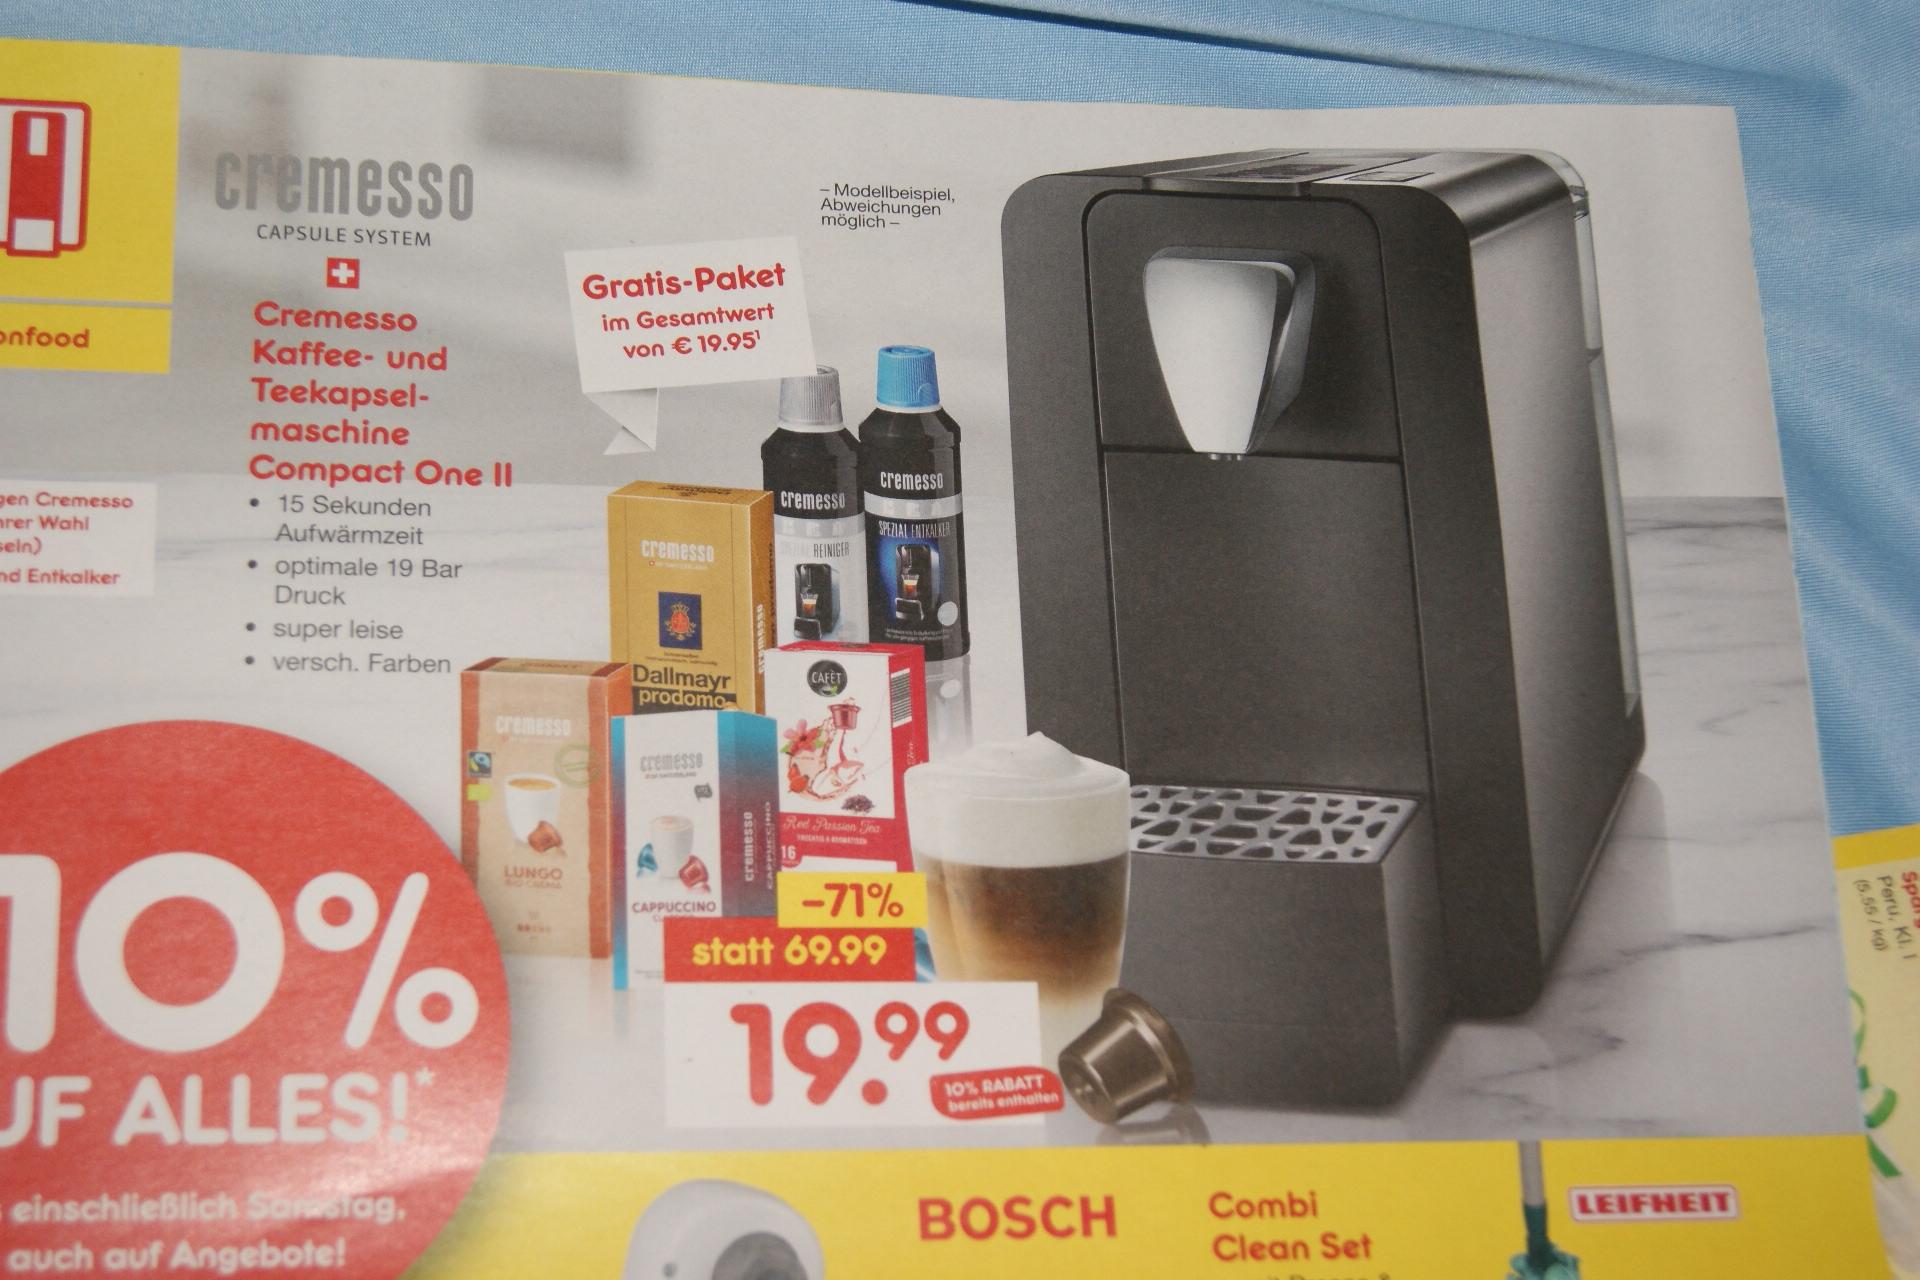 Cremeso Kaffee- und Teekapselmaschine + 48 Kapseln (Wert: 19,95€) für 19,99 Euro (lokal Berlin)